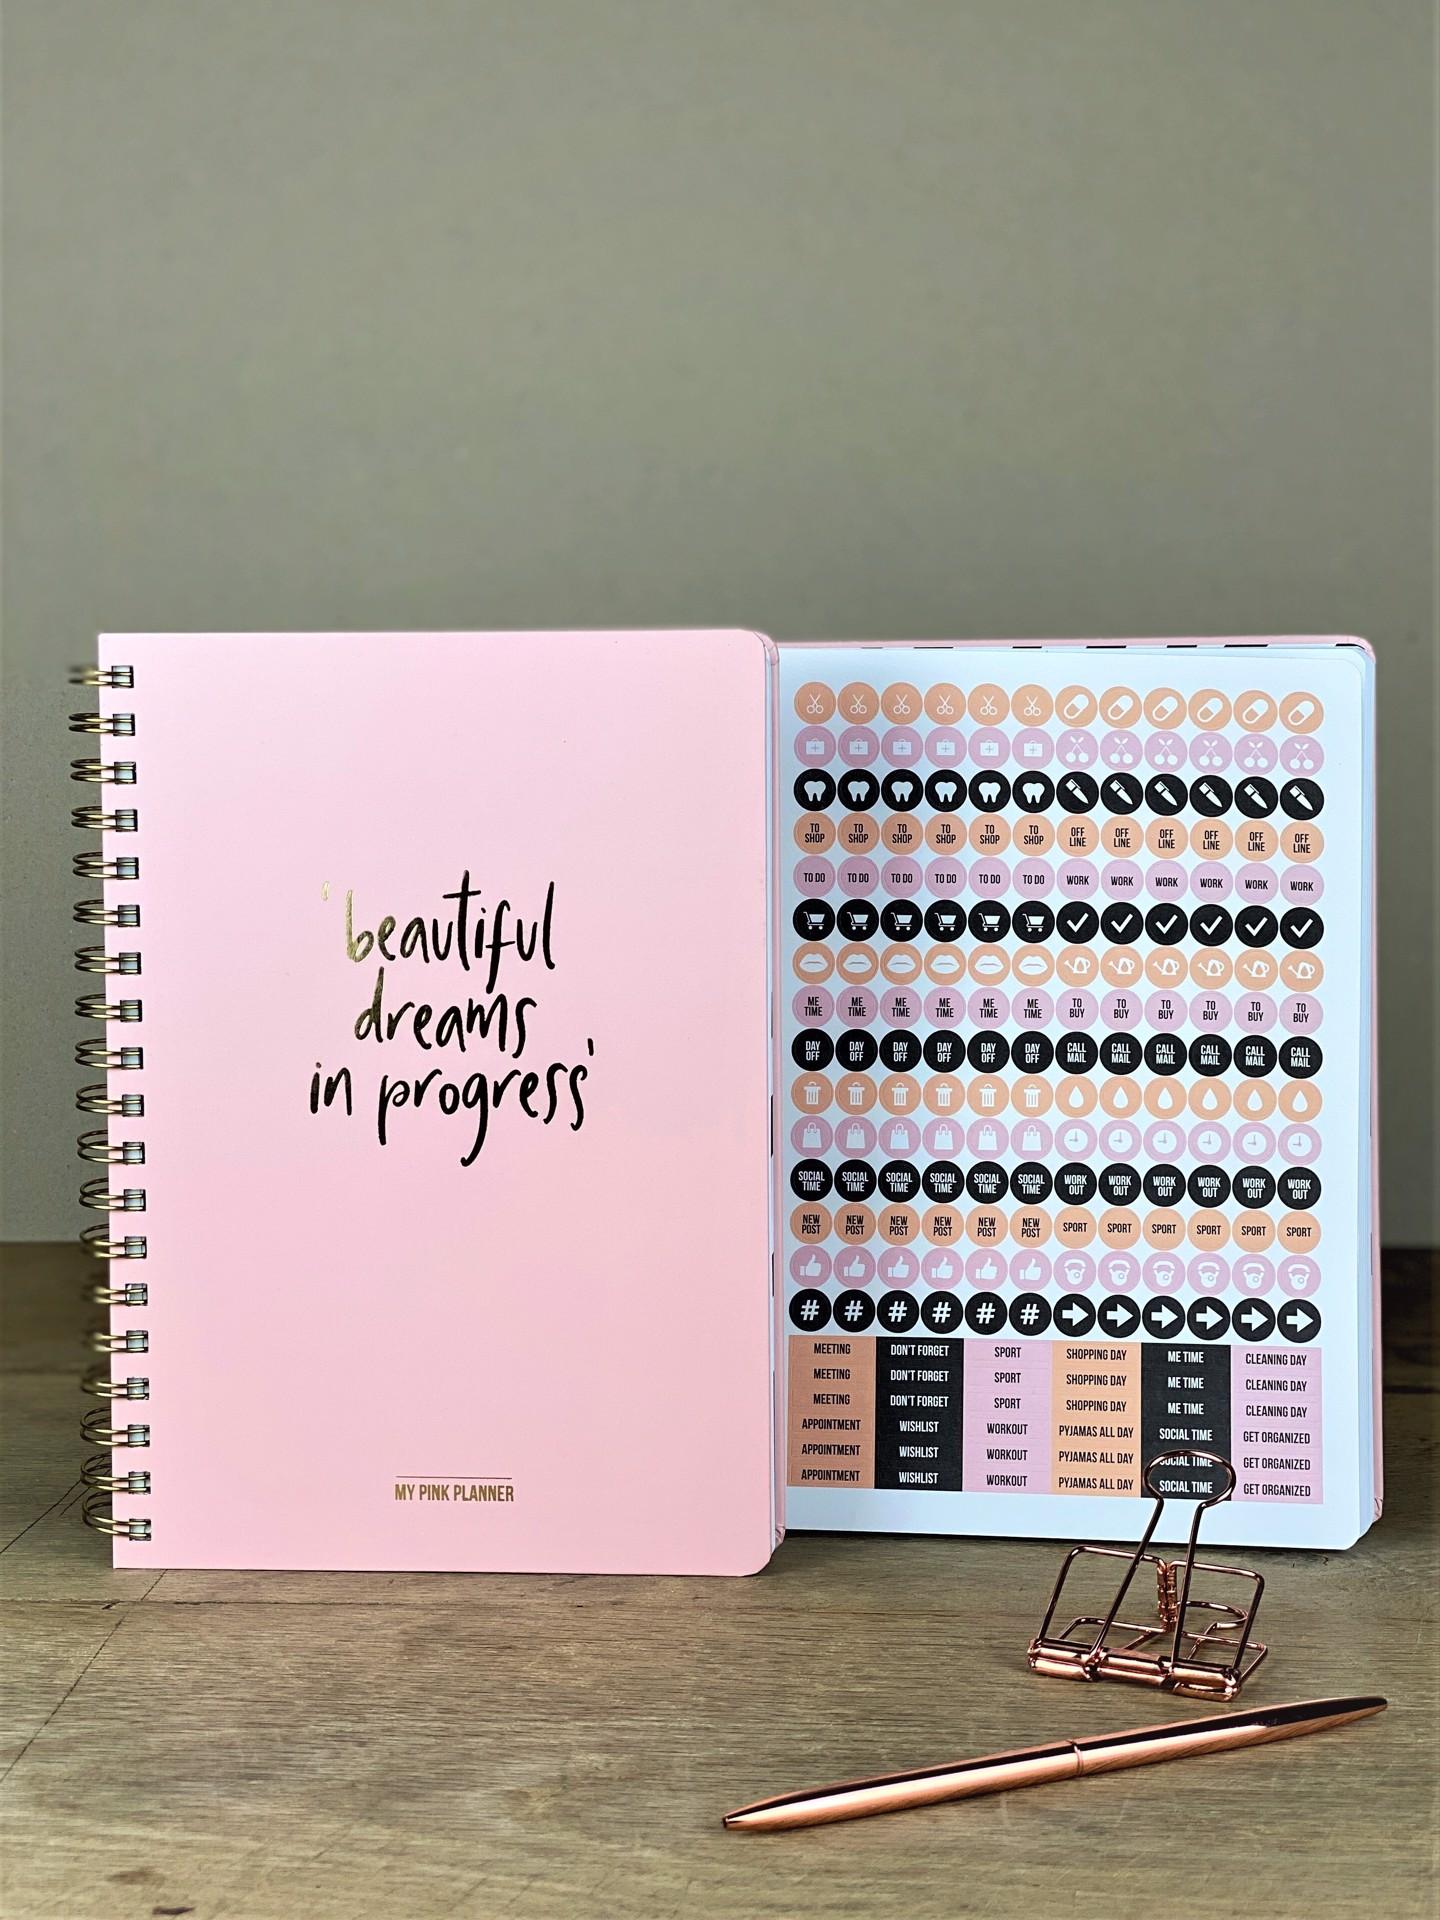 Kalender undatiert beautiful dreams